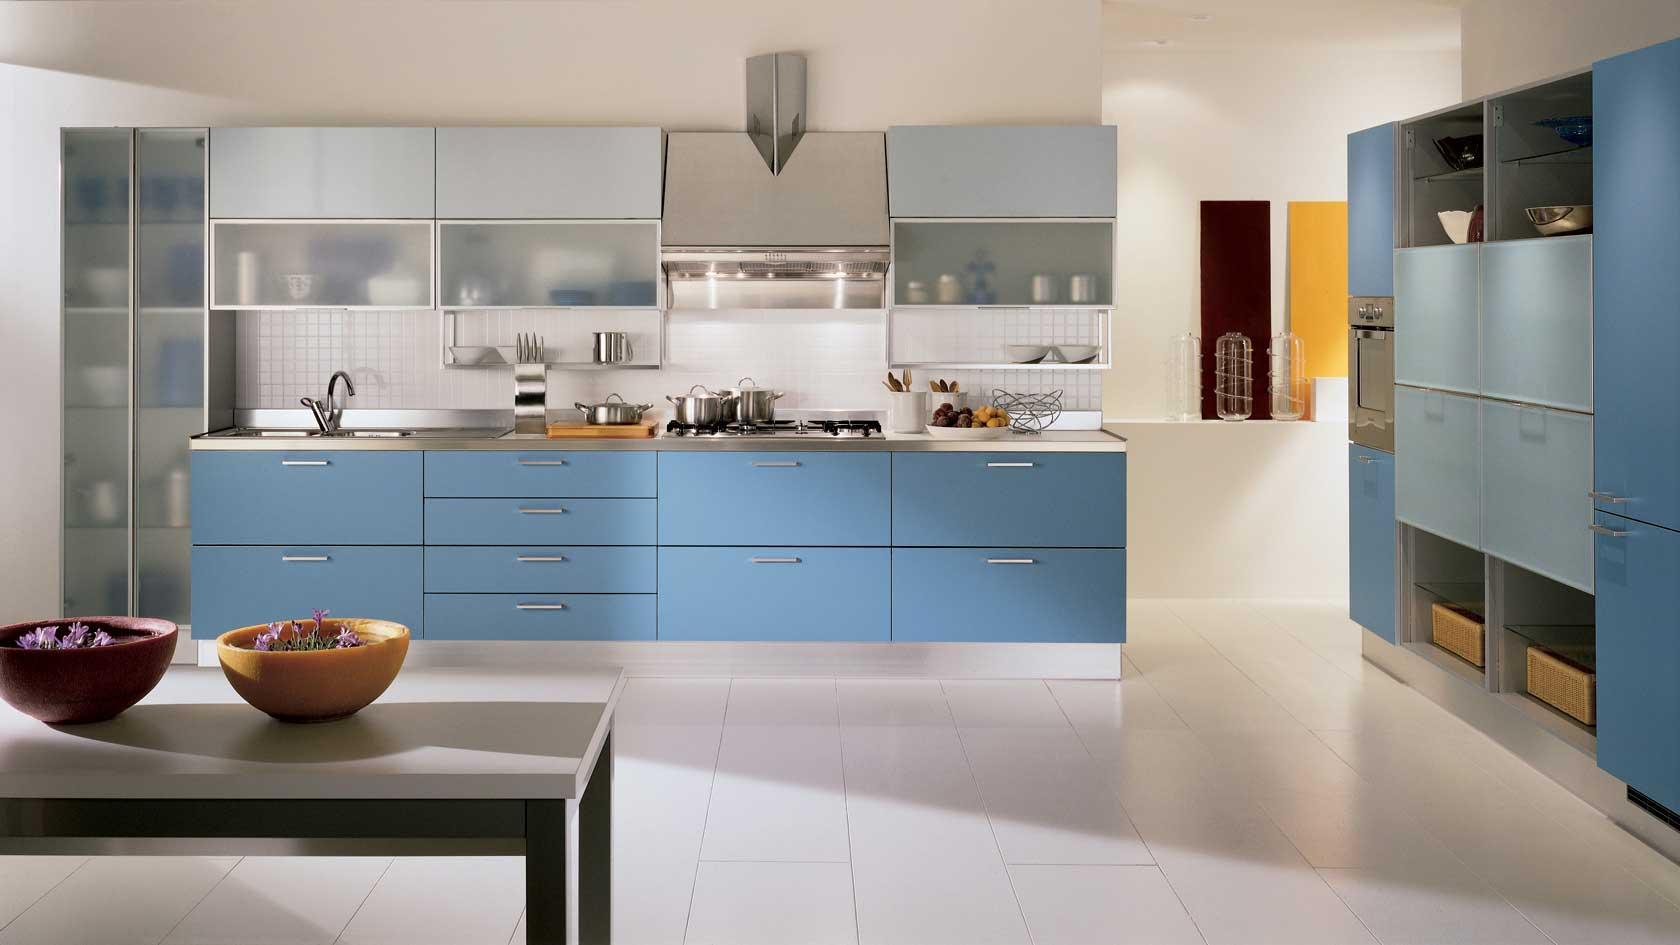 Scavolini | Dream Kitchen by Vuesse | Wood - Furniture.biz